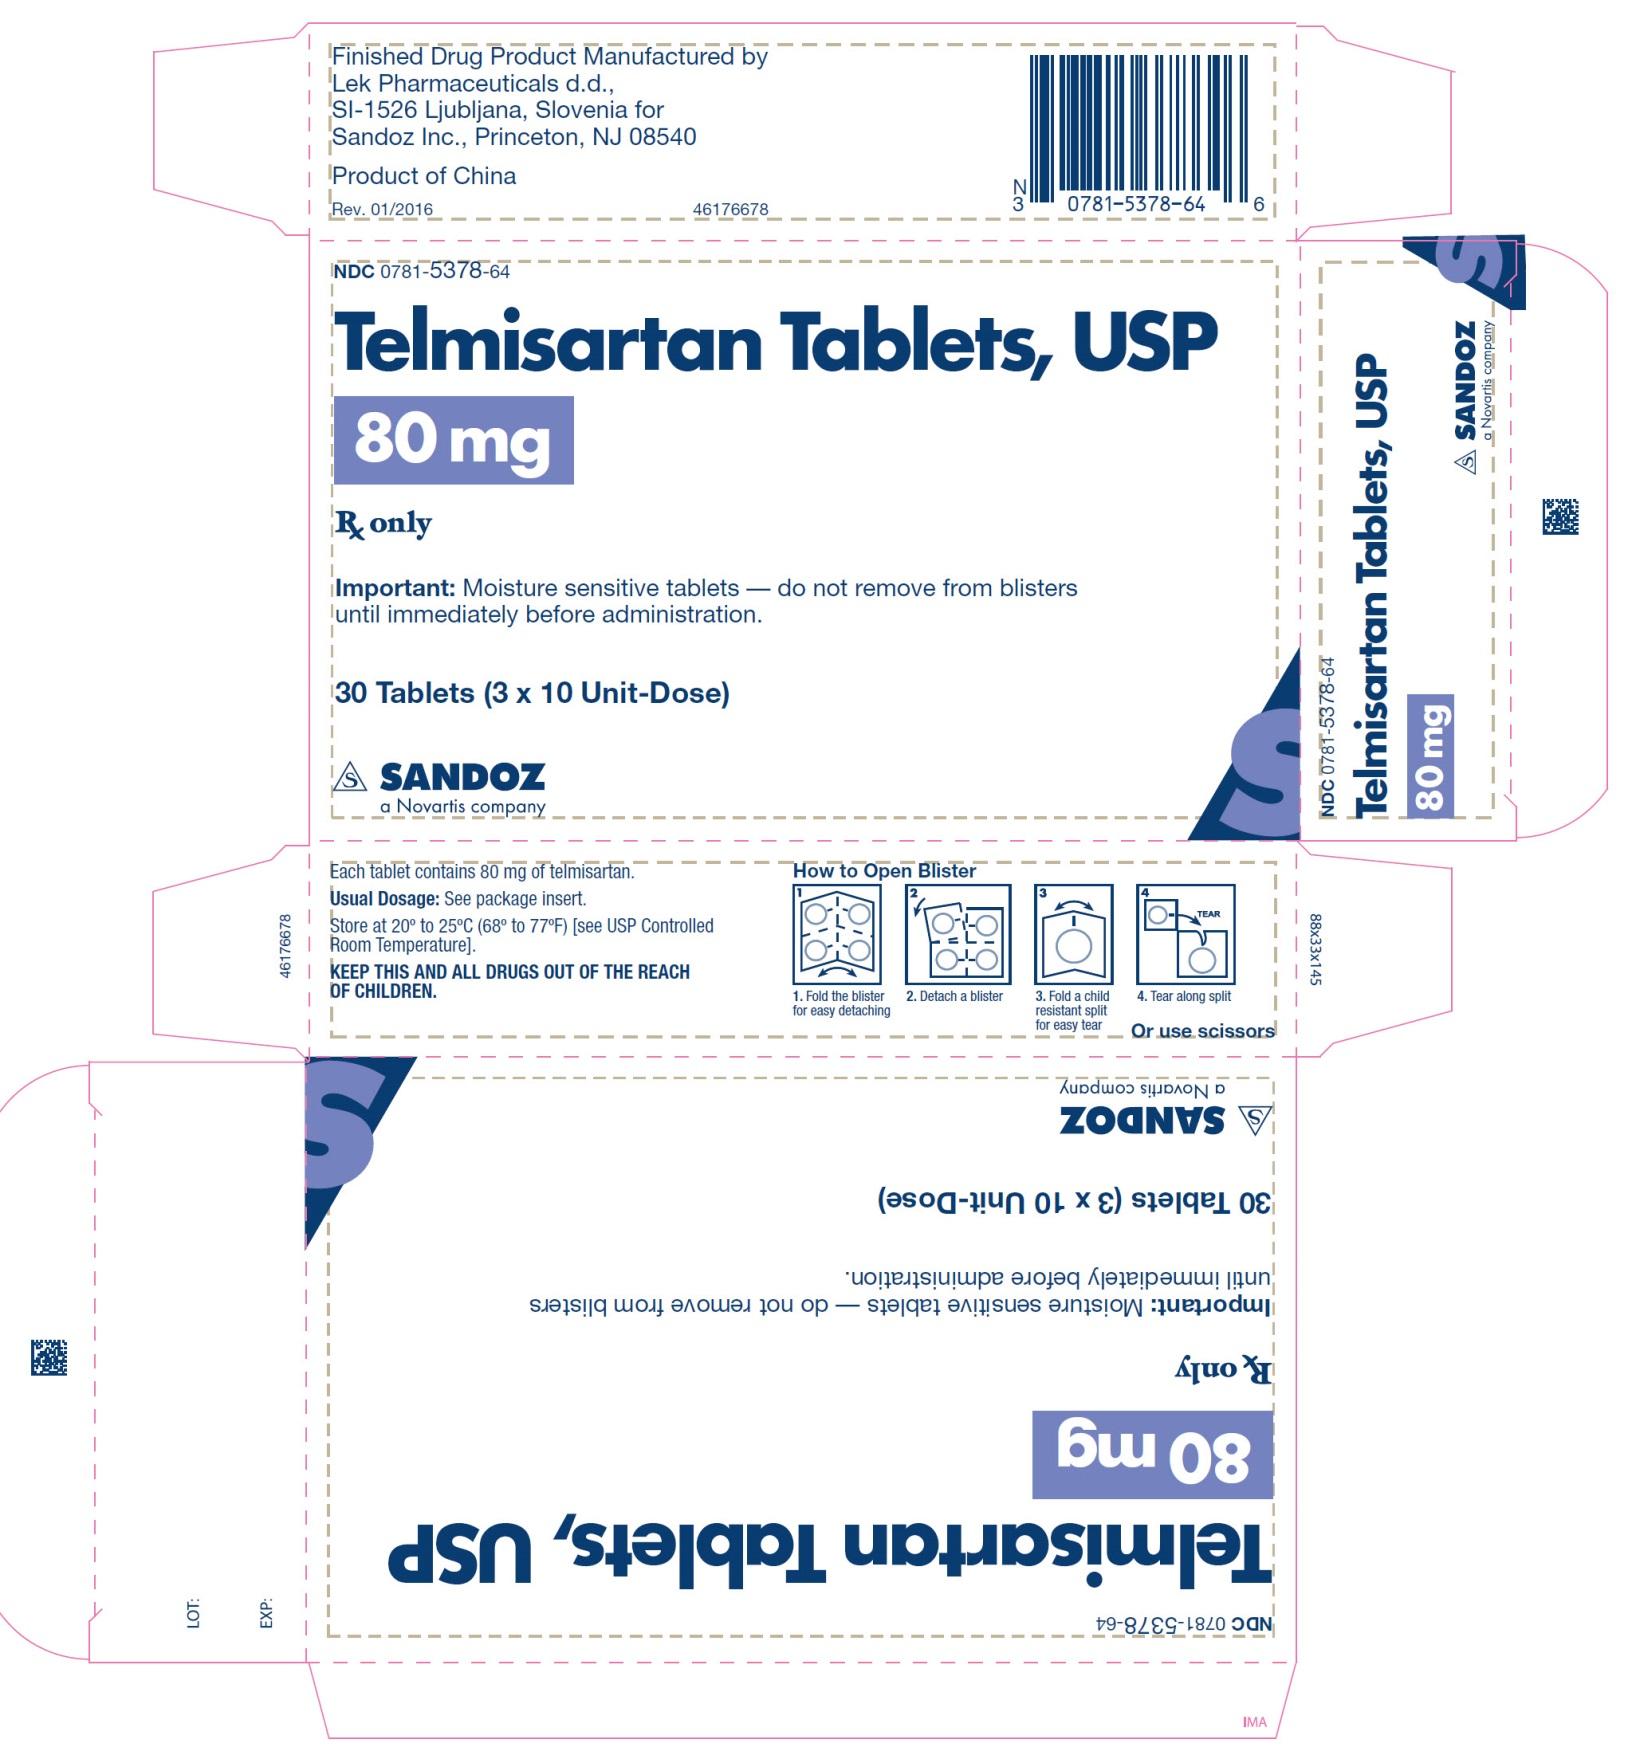 80 mg carton